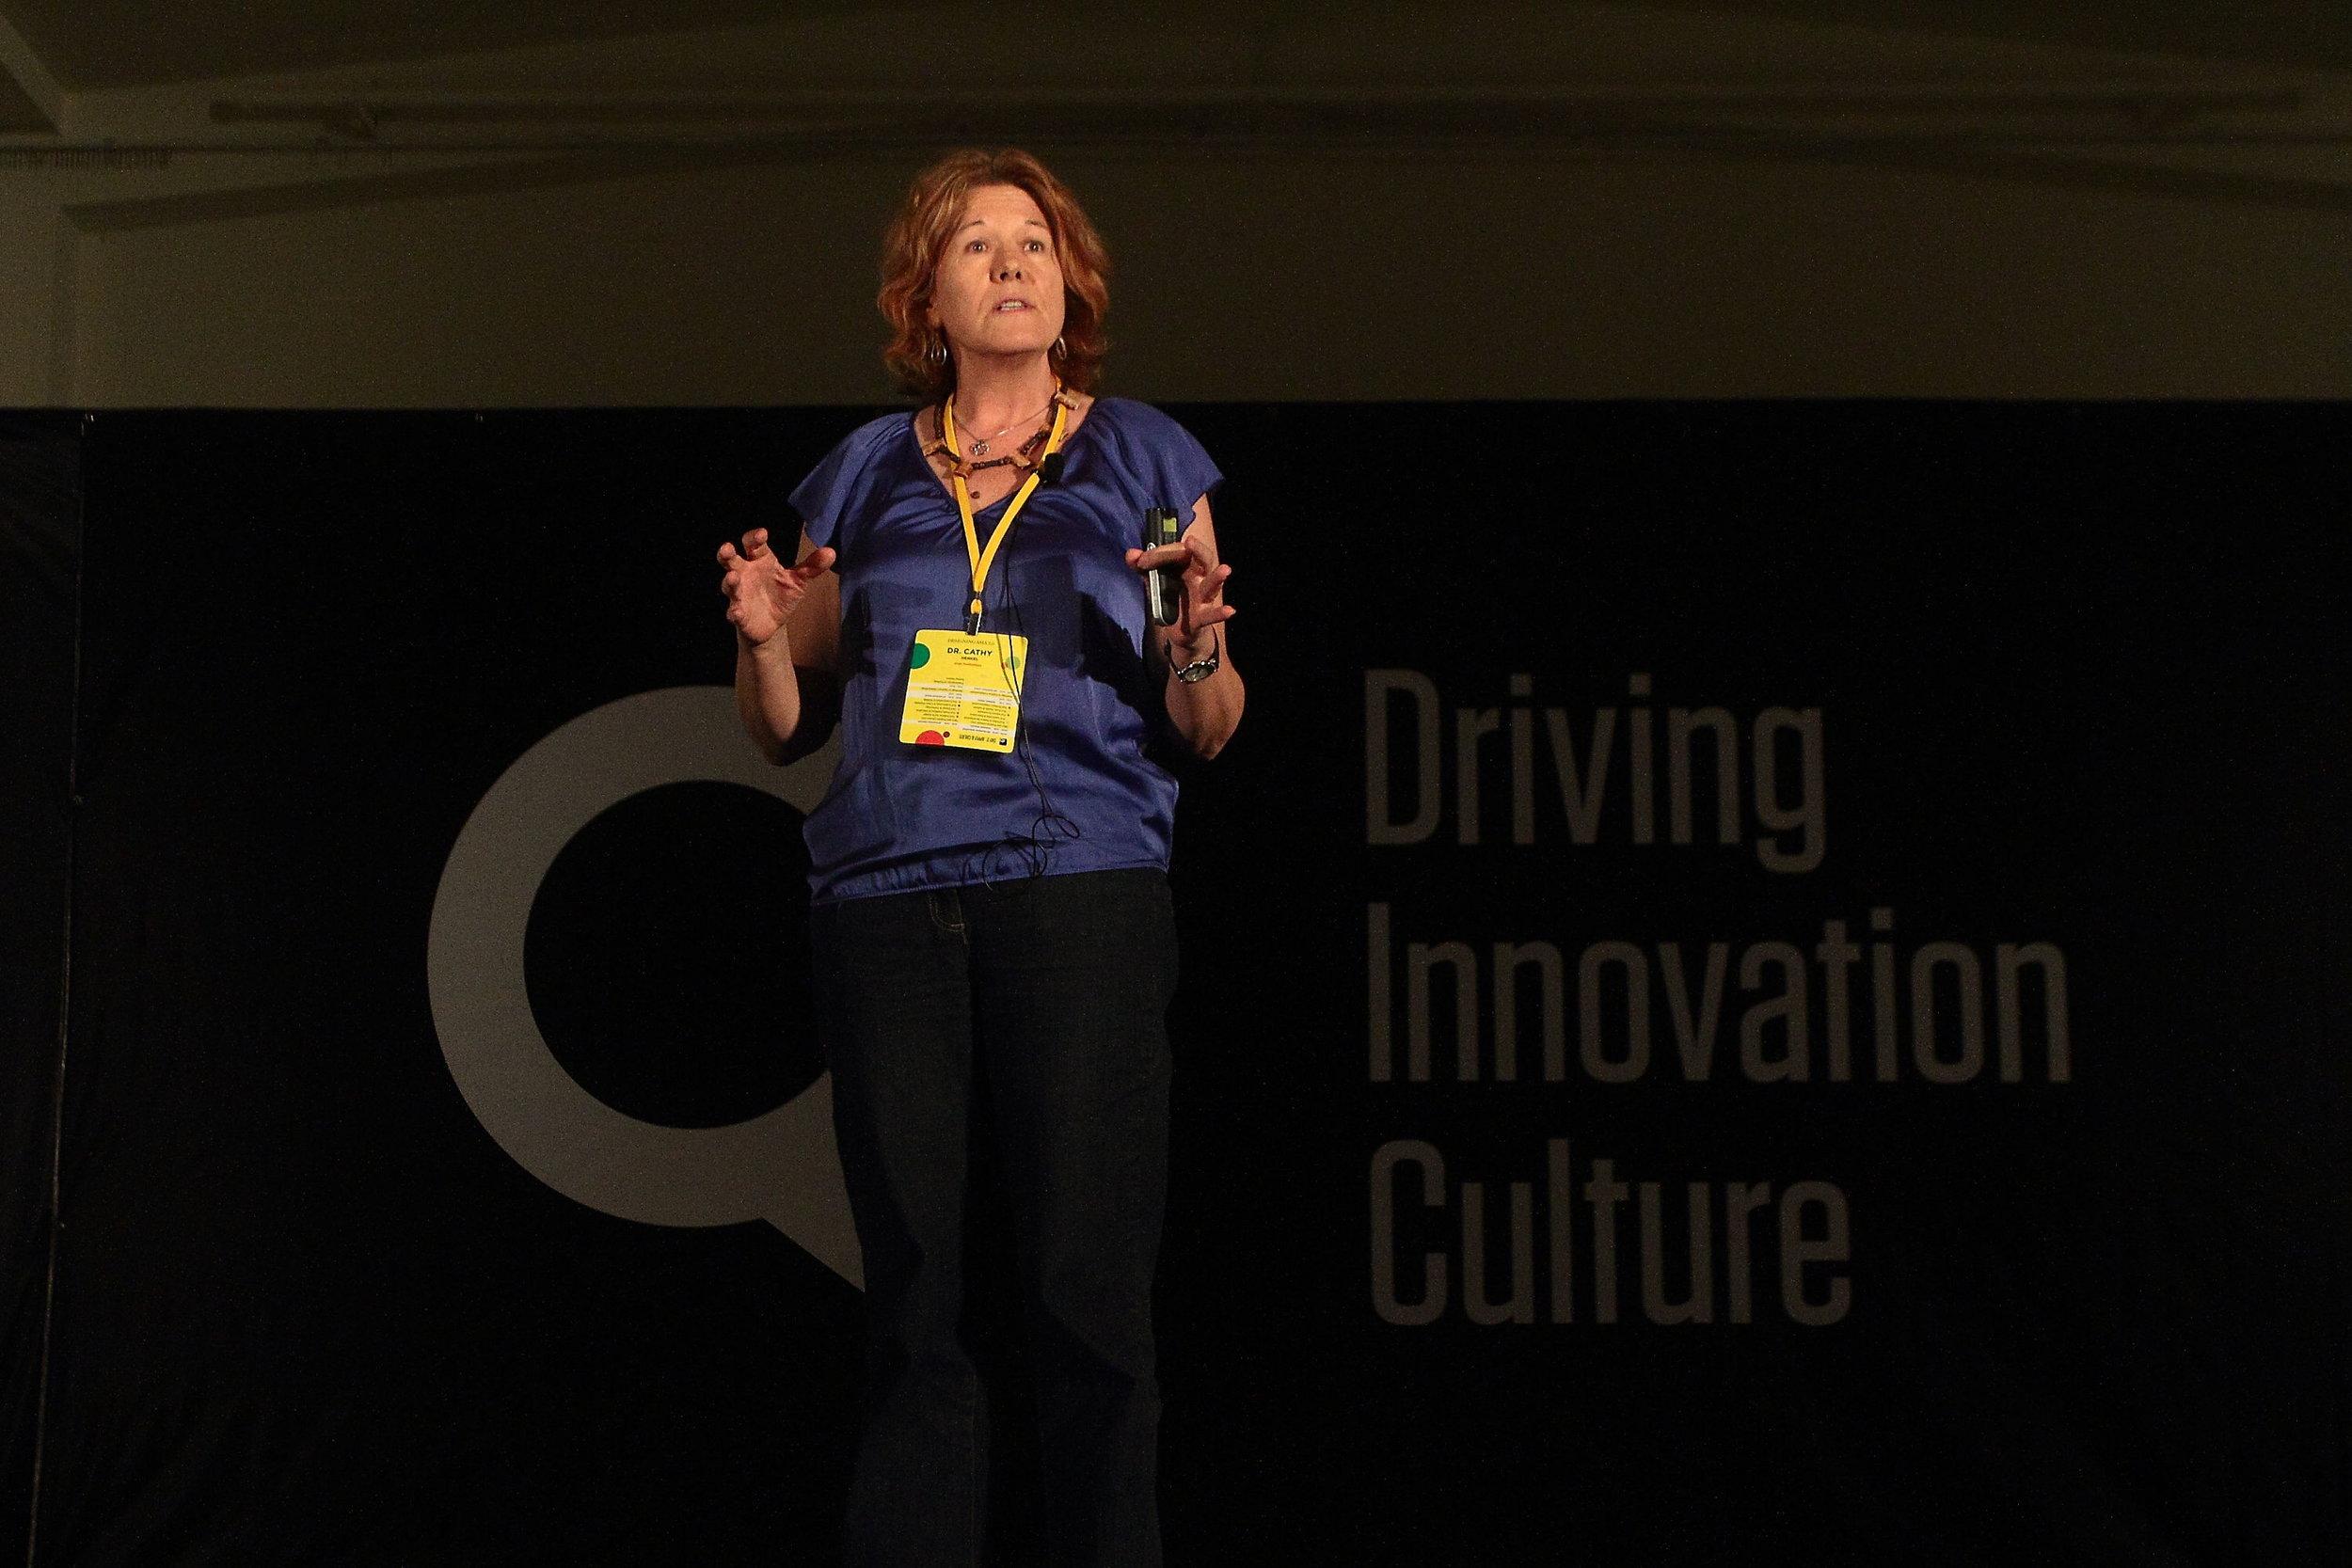 qi-global-2011-driving-innovation-culture-089.jpg